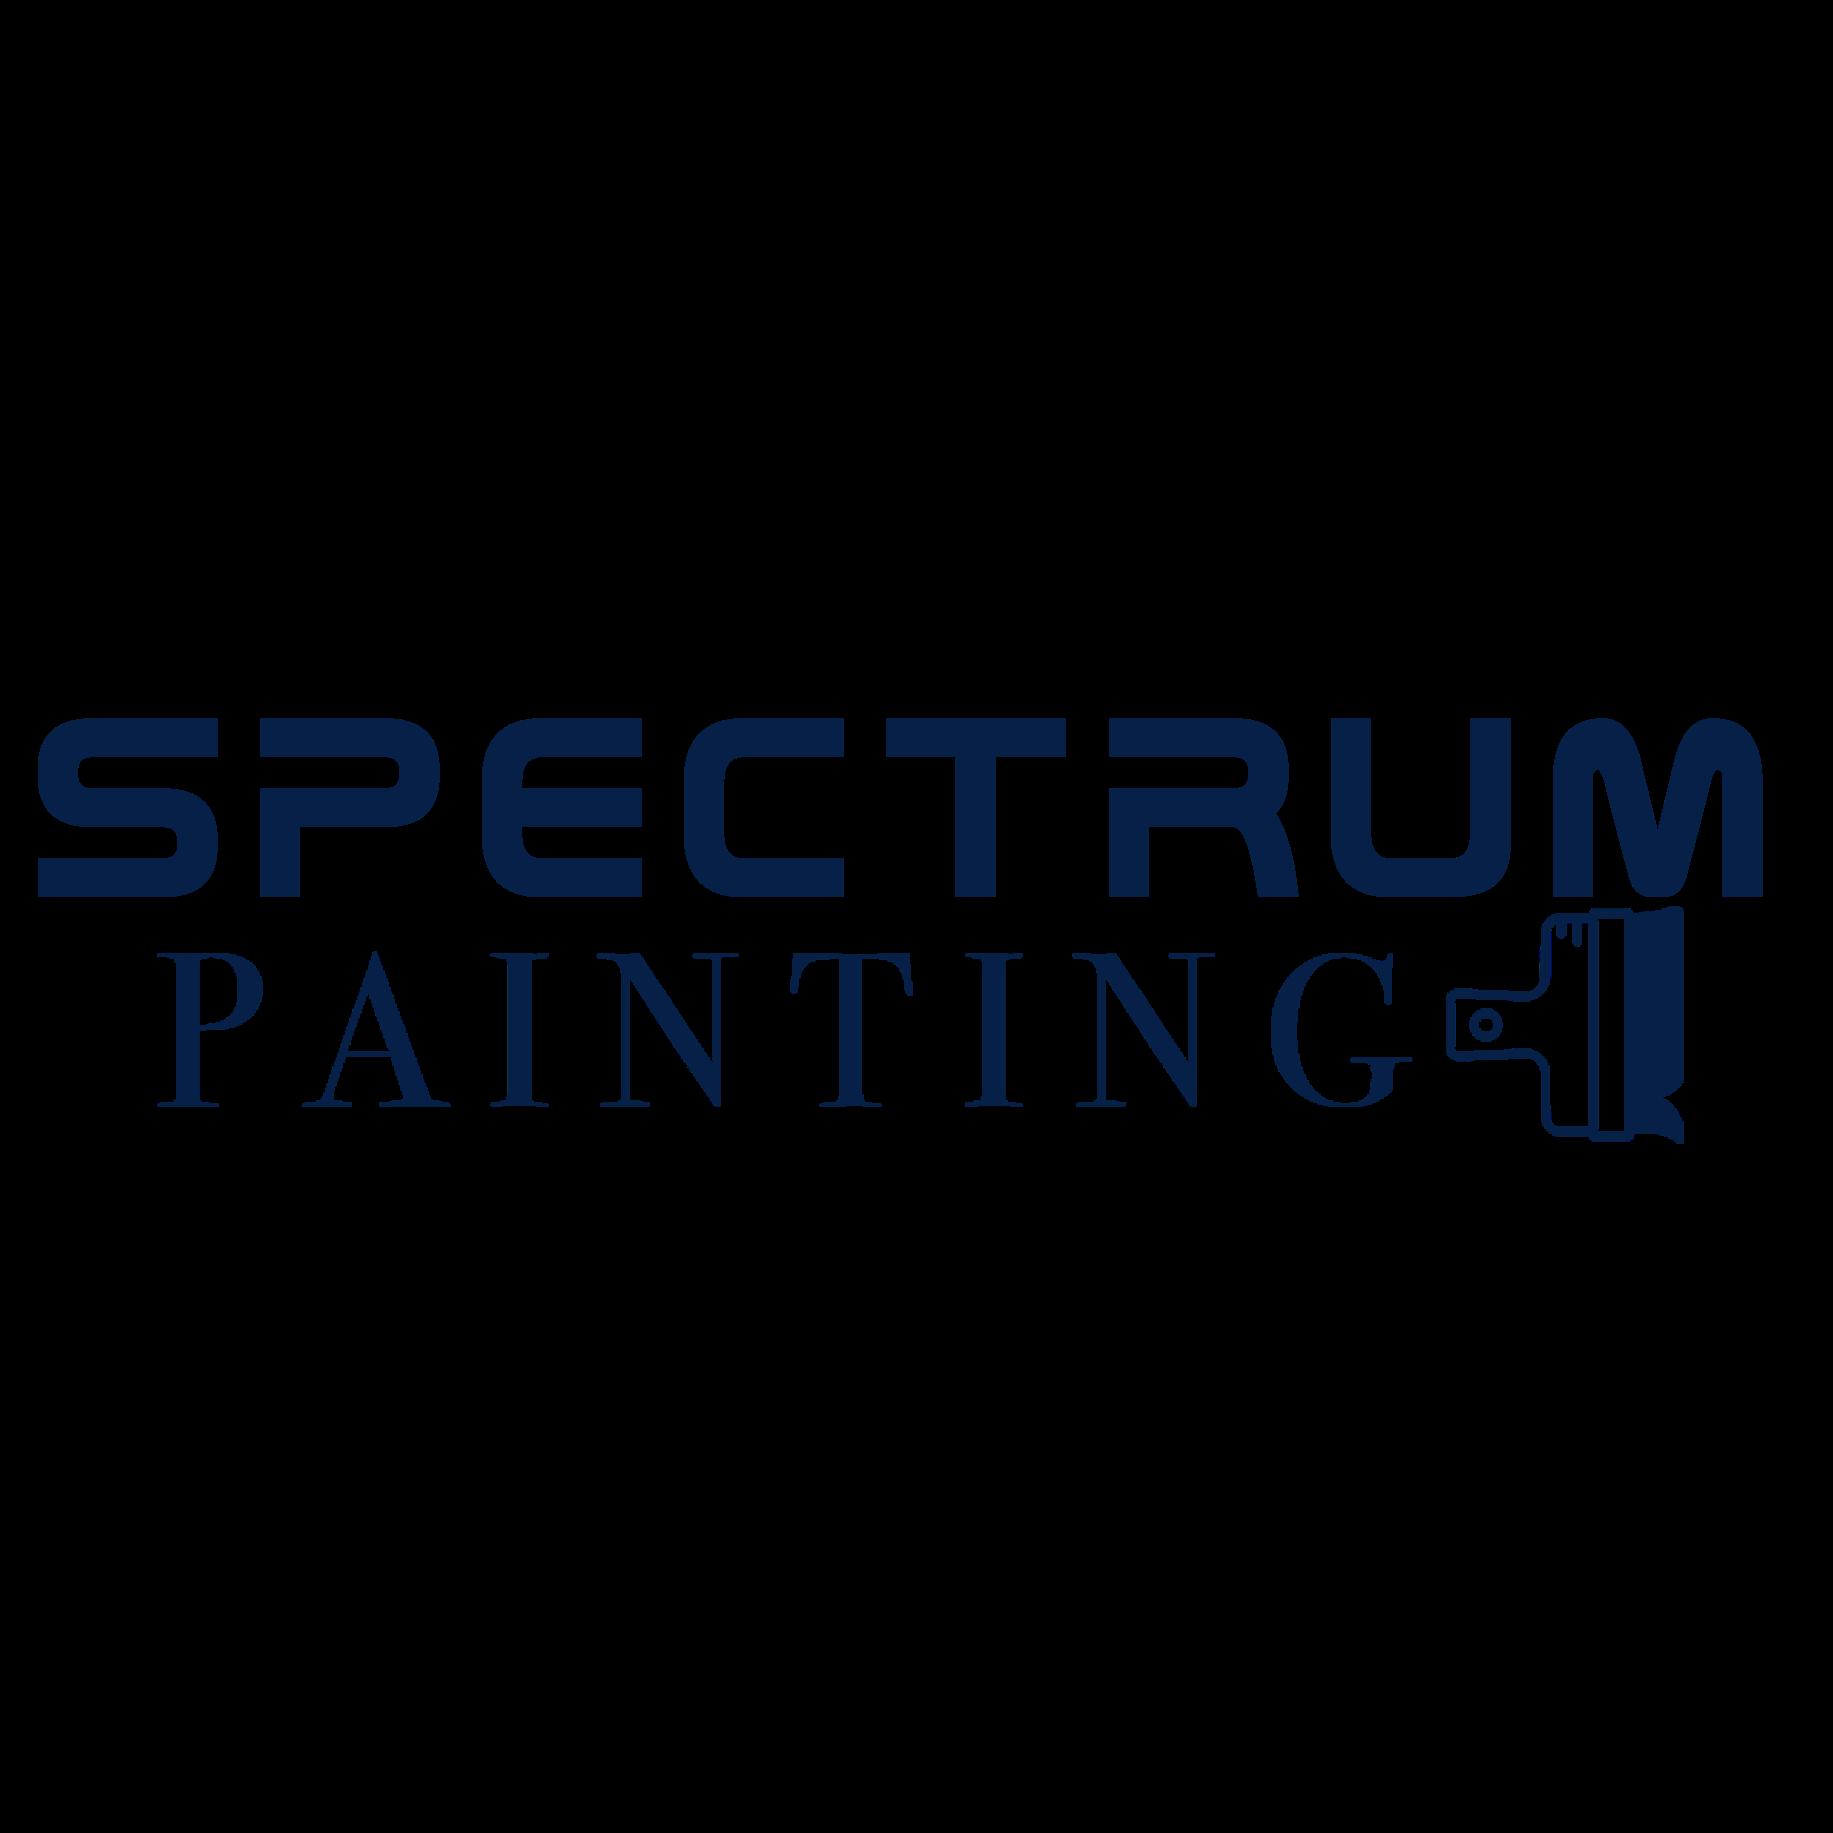 Spectrum Painting Chamberofcommerce Com